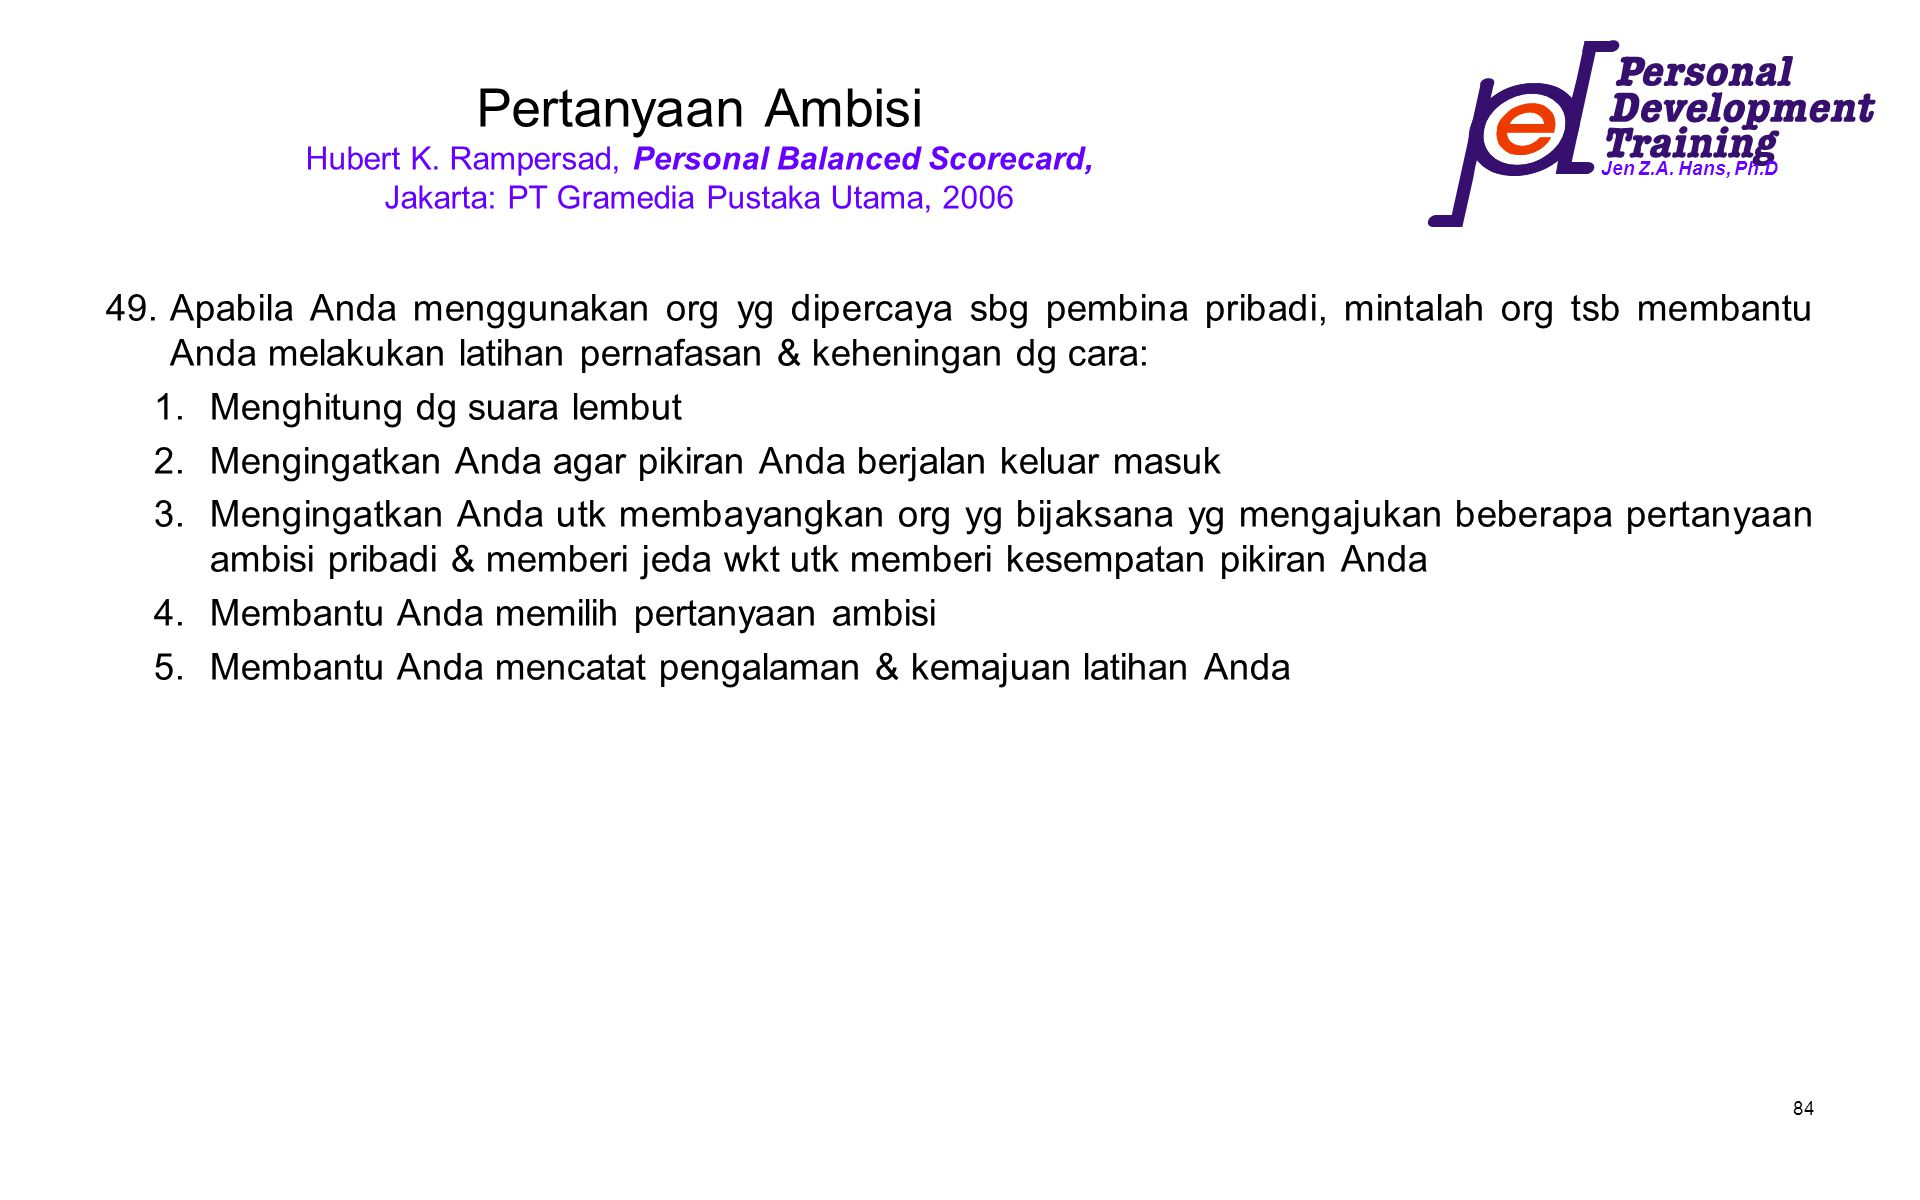 Jen Z.A. Hans, Ph.D 84 Pertanyaan Ambisi Hubert K. Rampersad, Personal Balanced Scorecard, Jakarta: PT Gramedia Pustaka Utama, 2006 49.Apabila Anda me